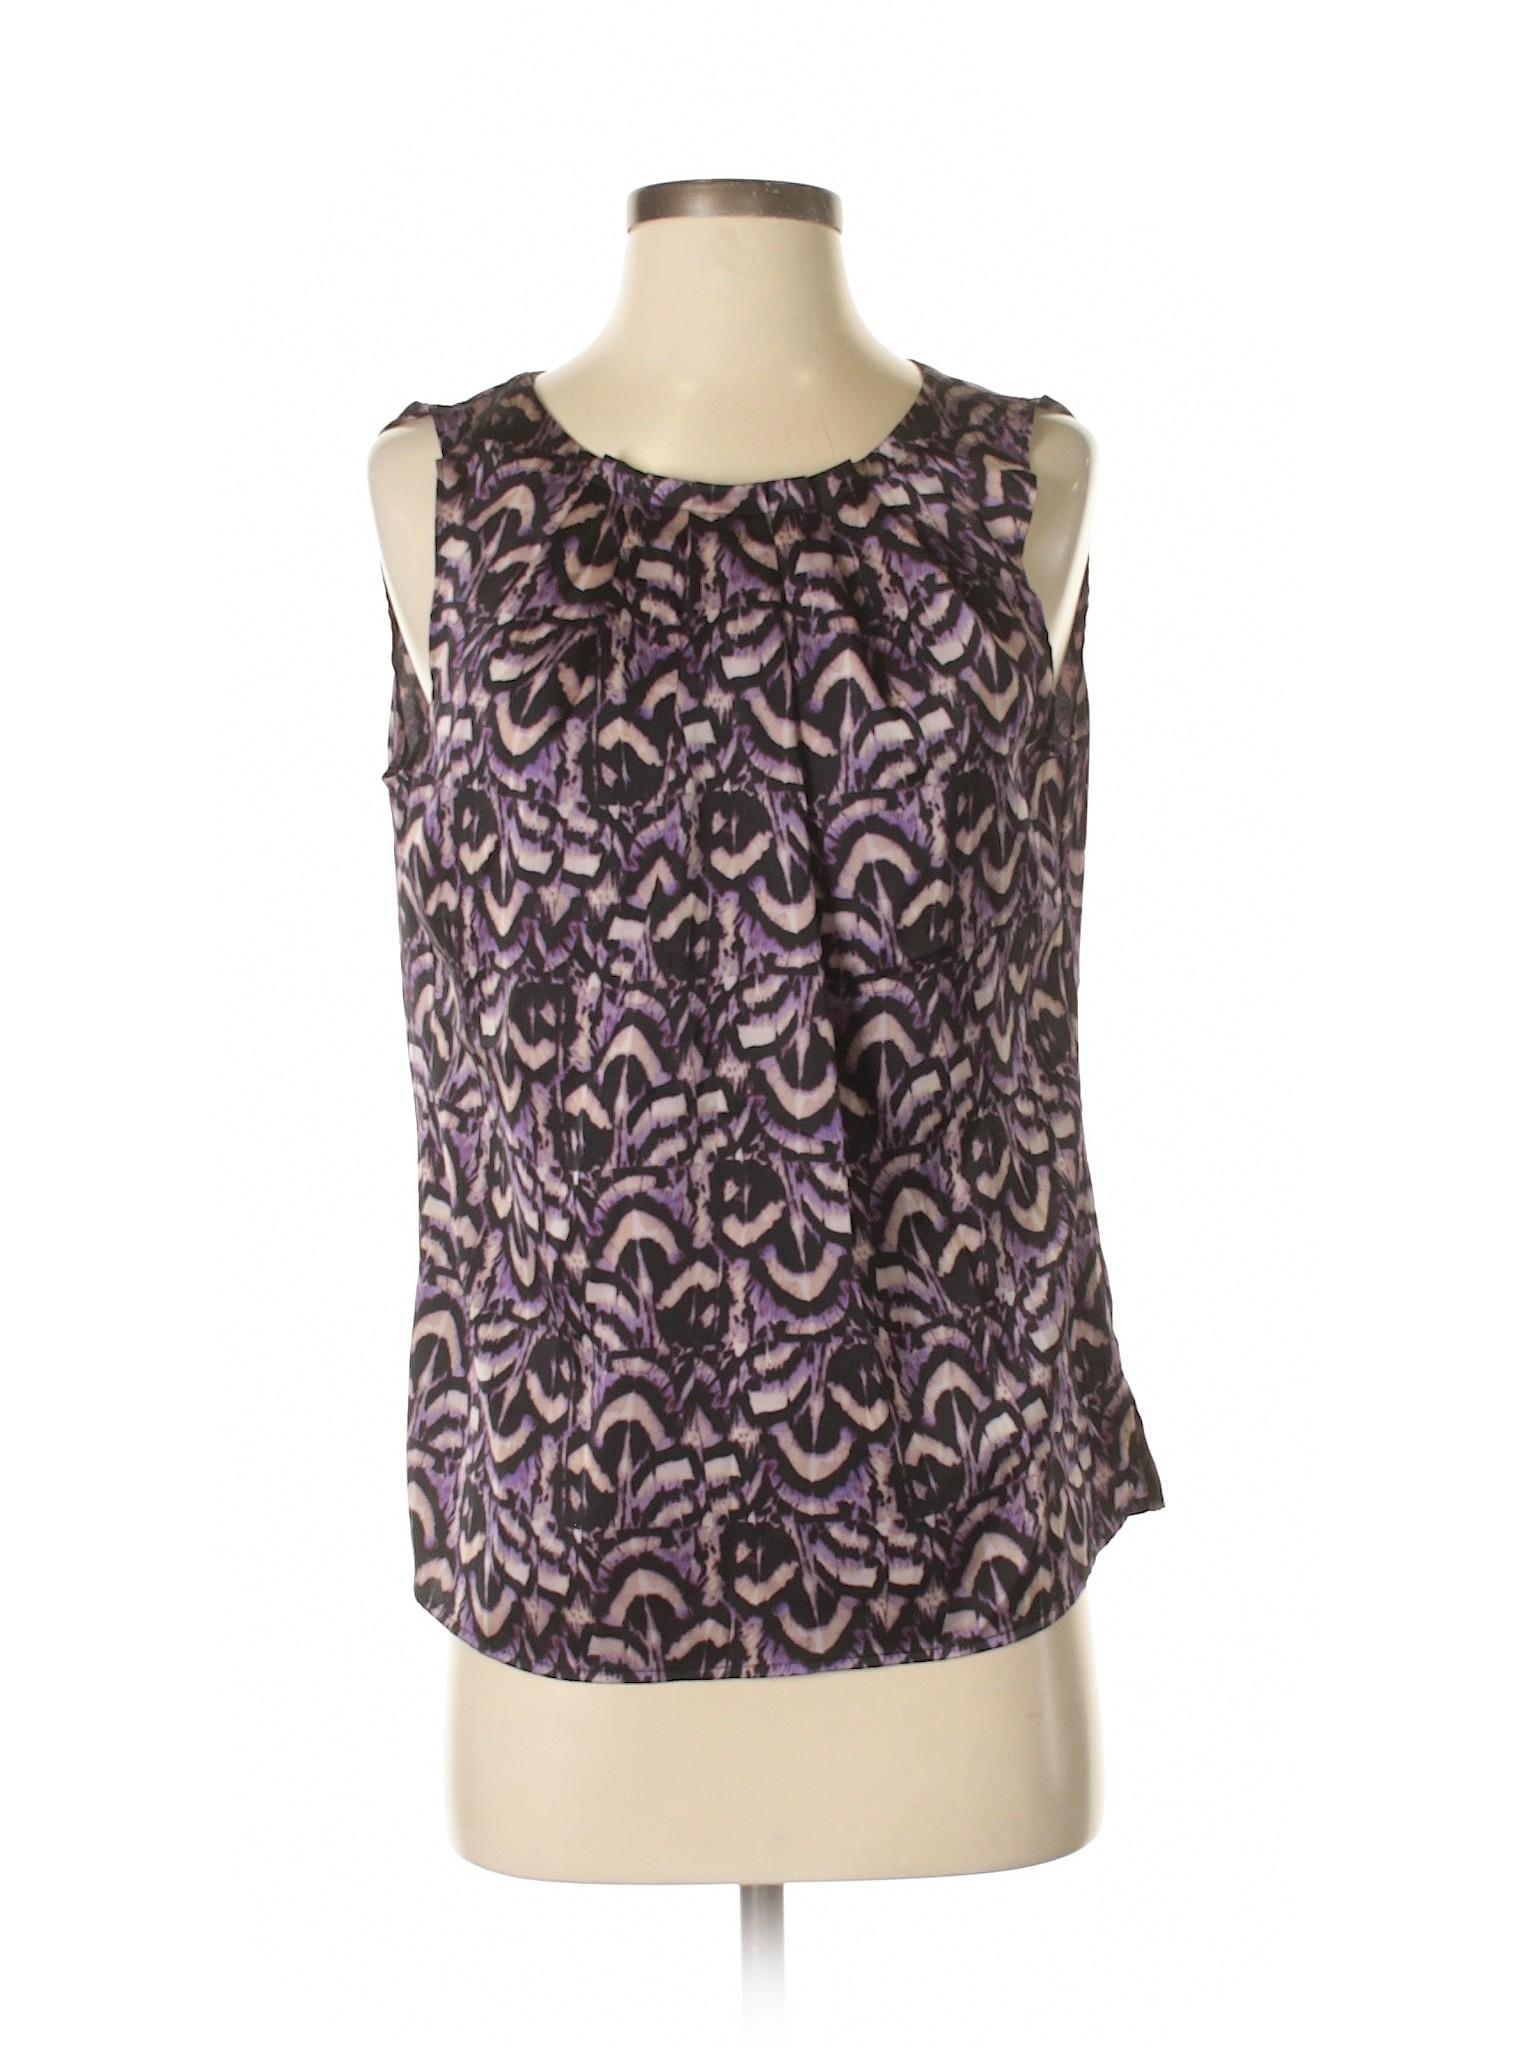 Dress Dress Boutique winter Boutique Chaus Casual Casual winter Chaus wqnx8ORR